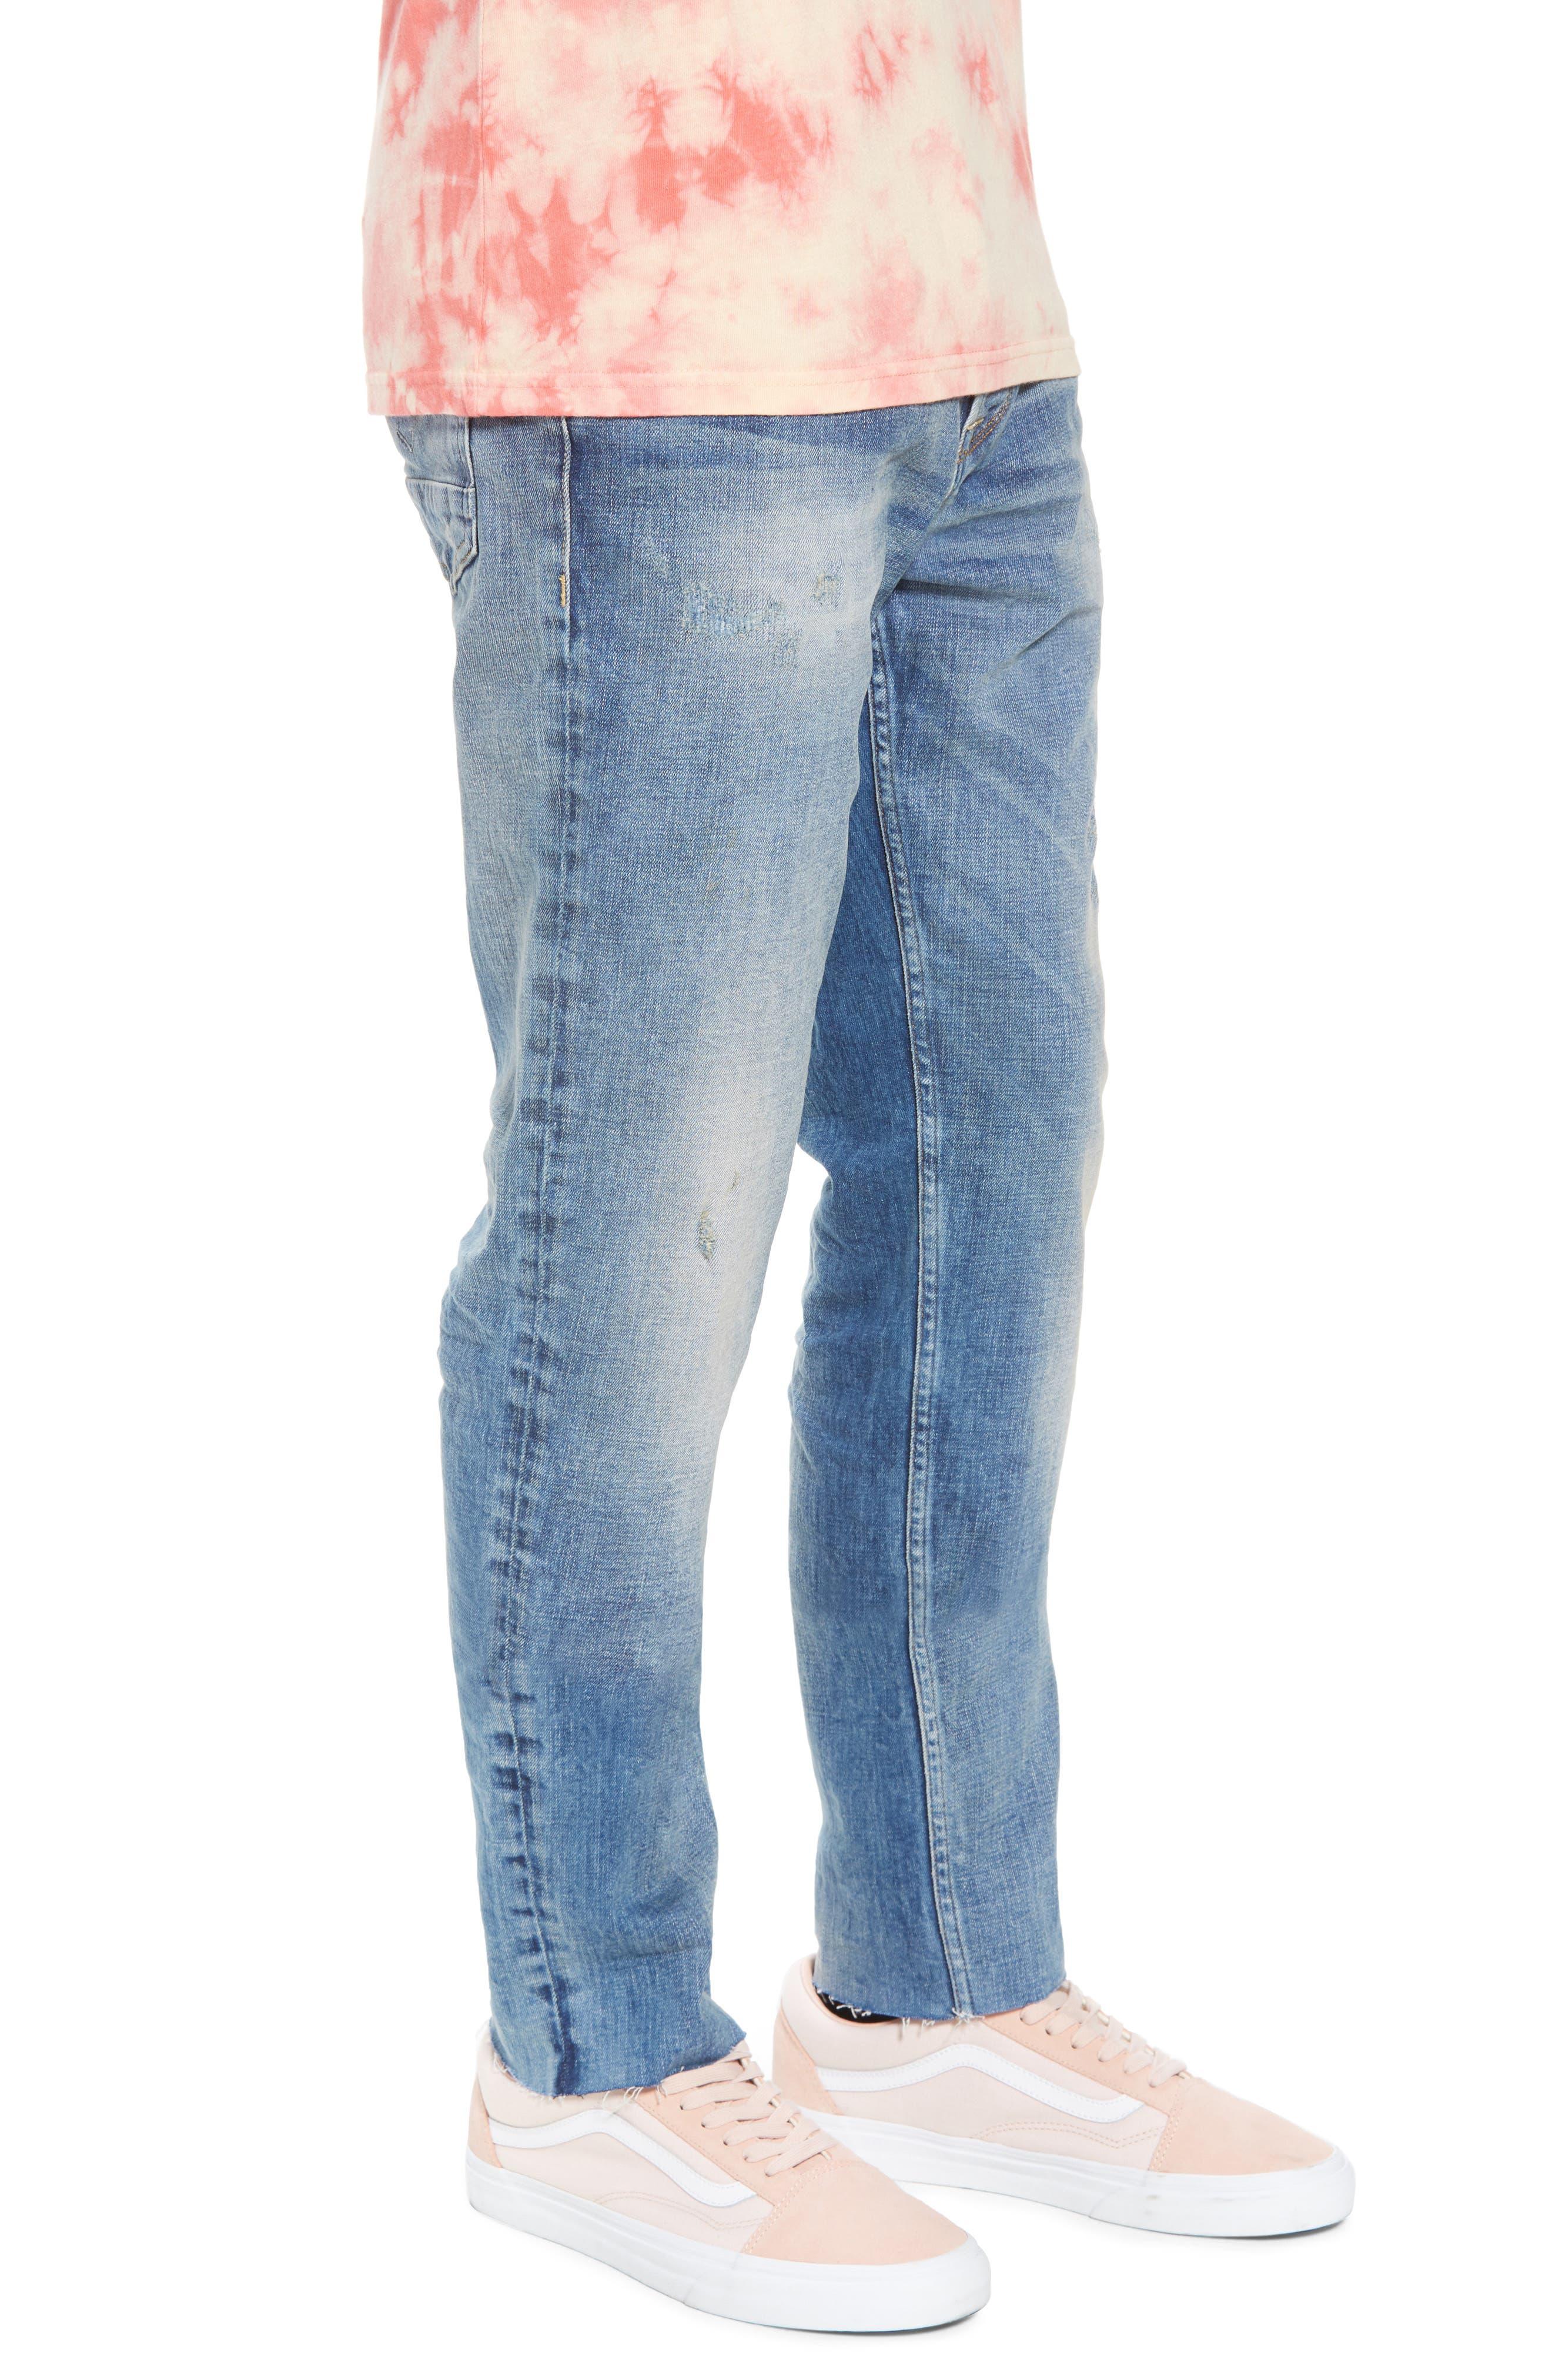 Sartor Slouchy Skinny Fit Jeans,                             Alternate thumbnail 3, color,                             Los Feliz